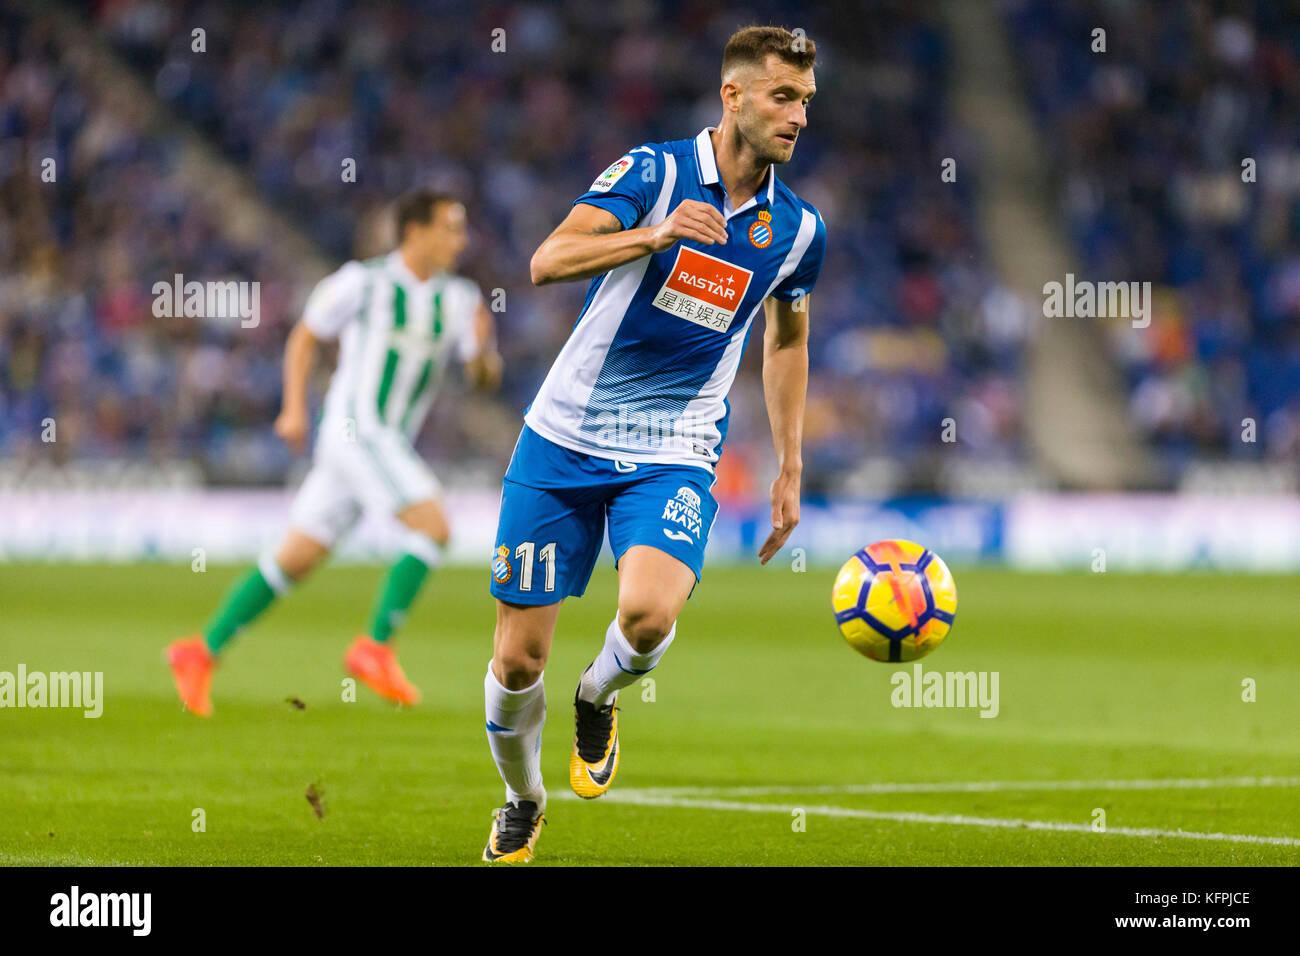 Barcelona, Spain. 30th Oct, 2017. RCD Espanyol forward Leo Baptistao (11) during the match between RCD Espanyol - Stock Image